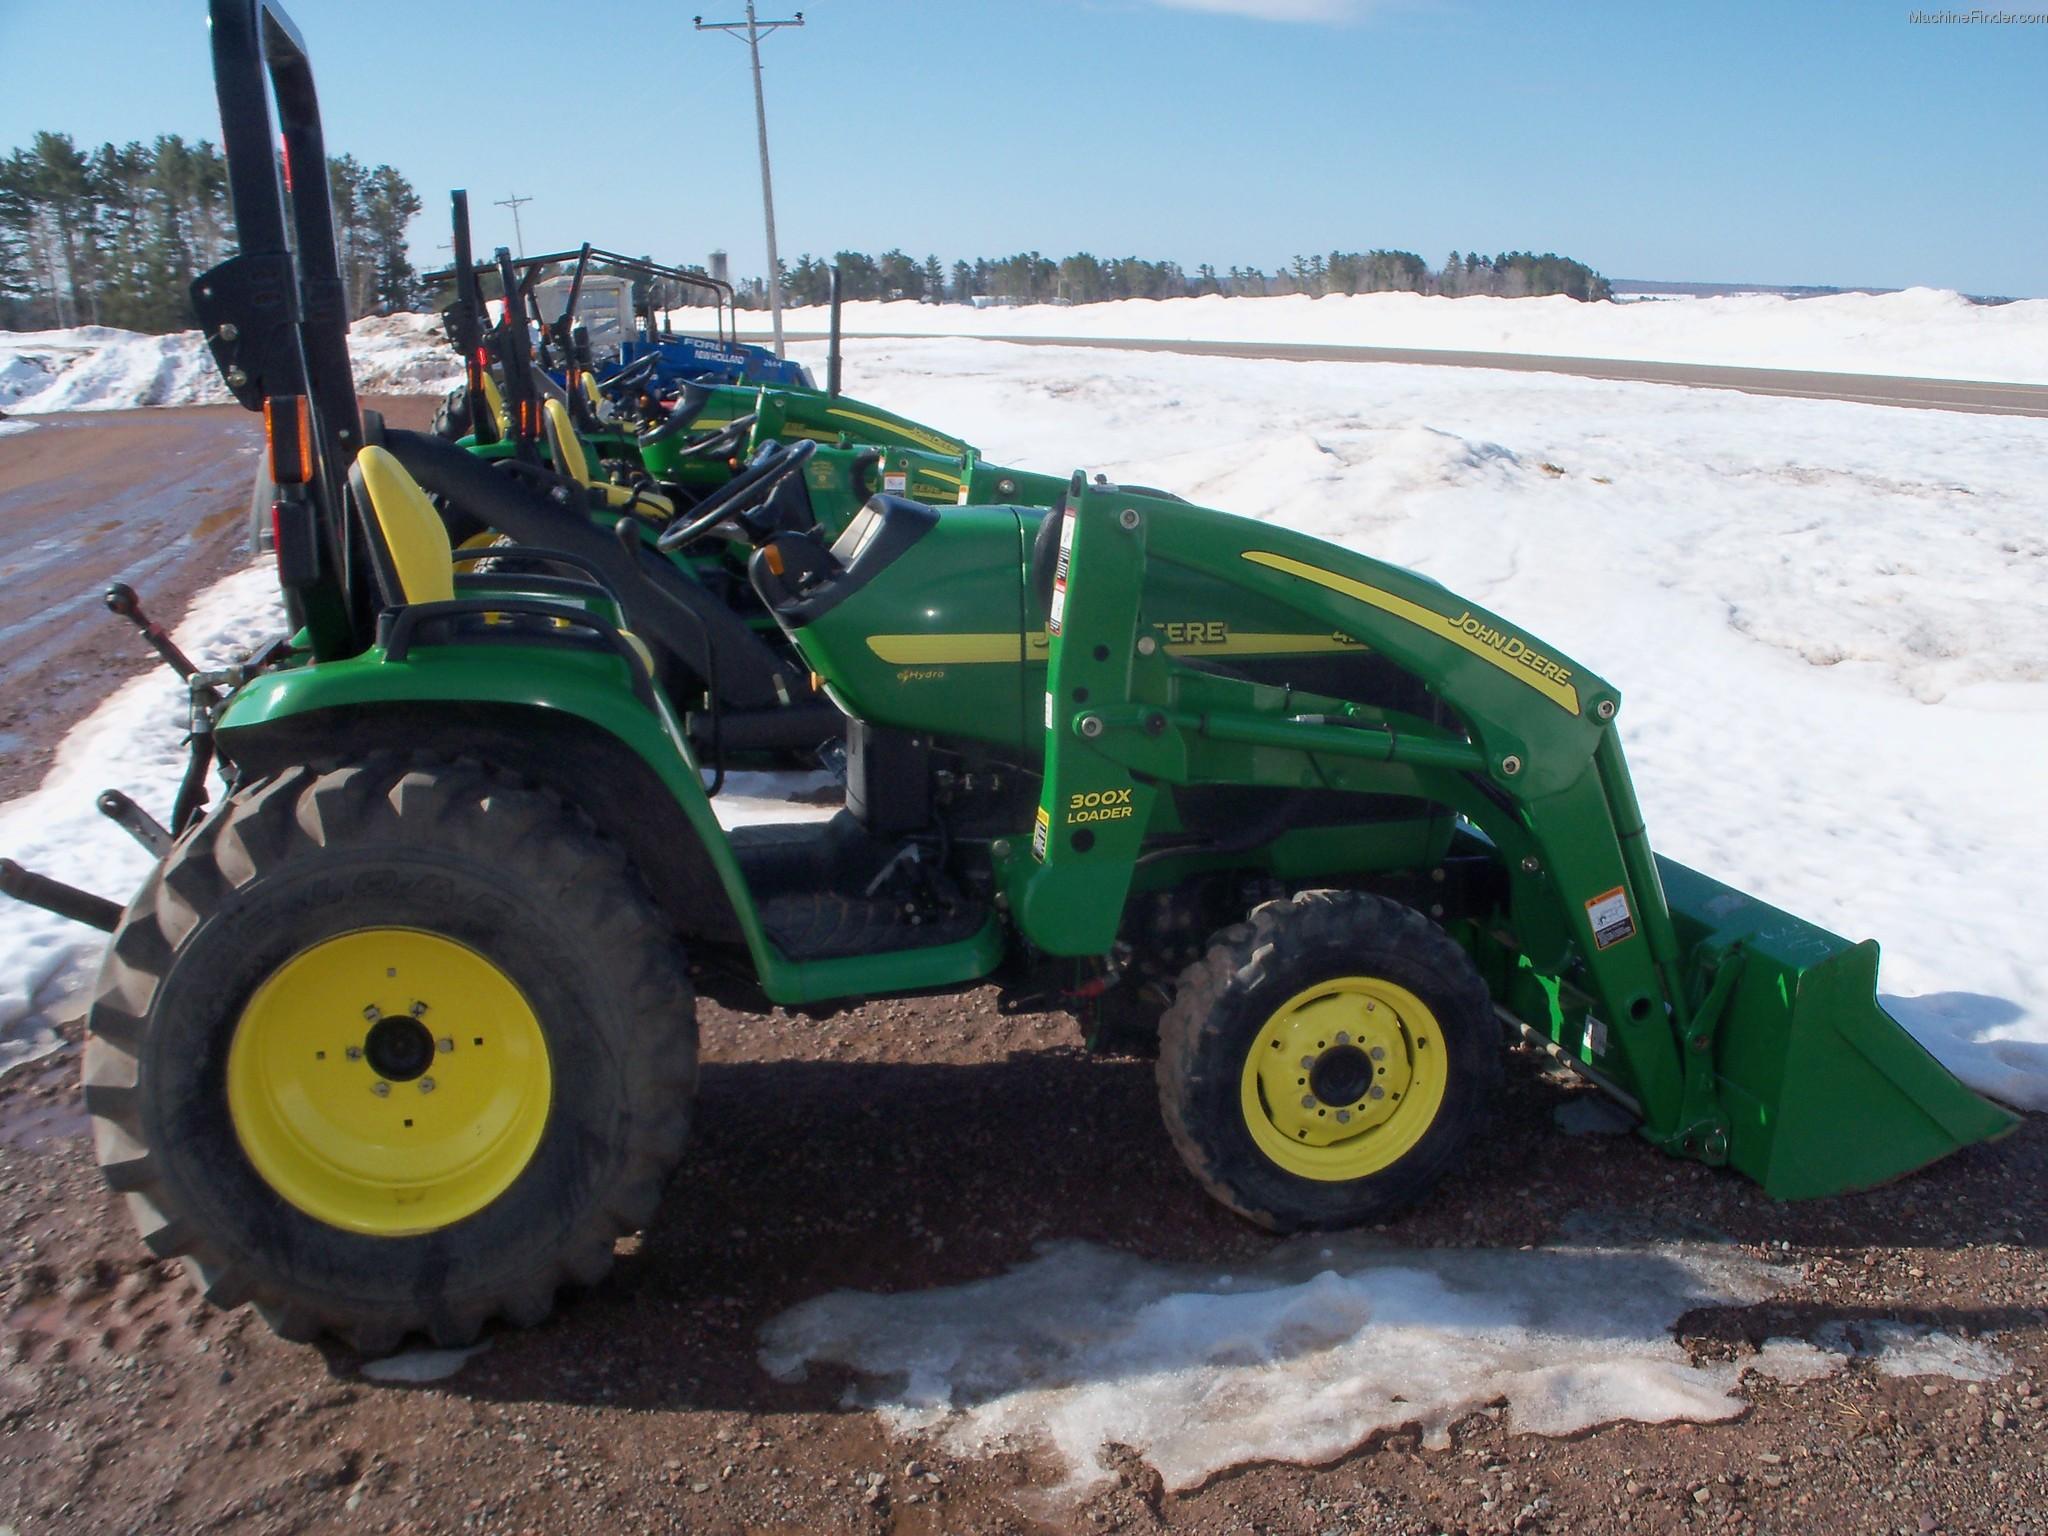 2002 John Deere 4210 Tractors - Compact (1-40hp.) - John ...